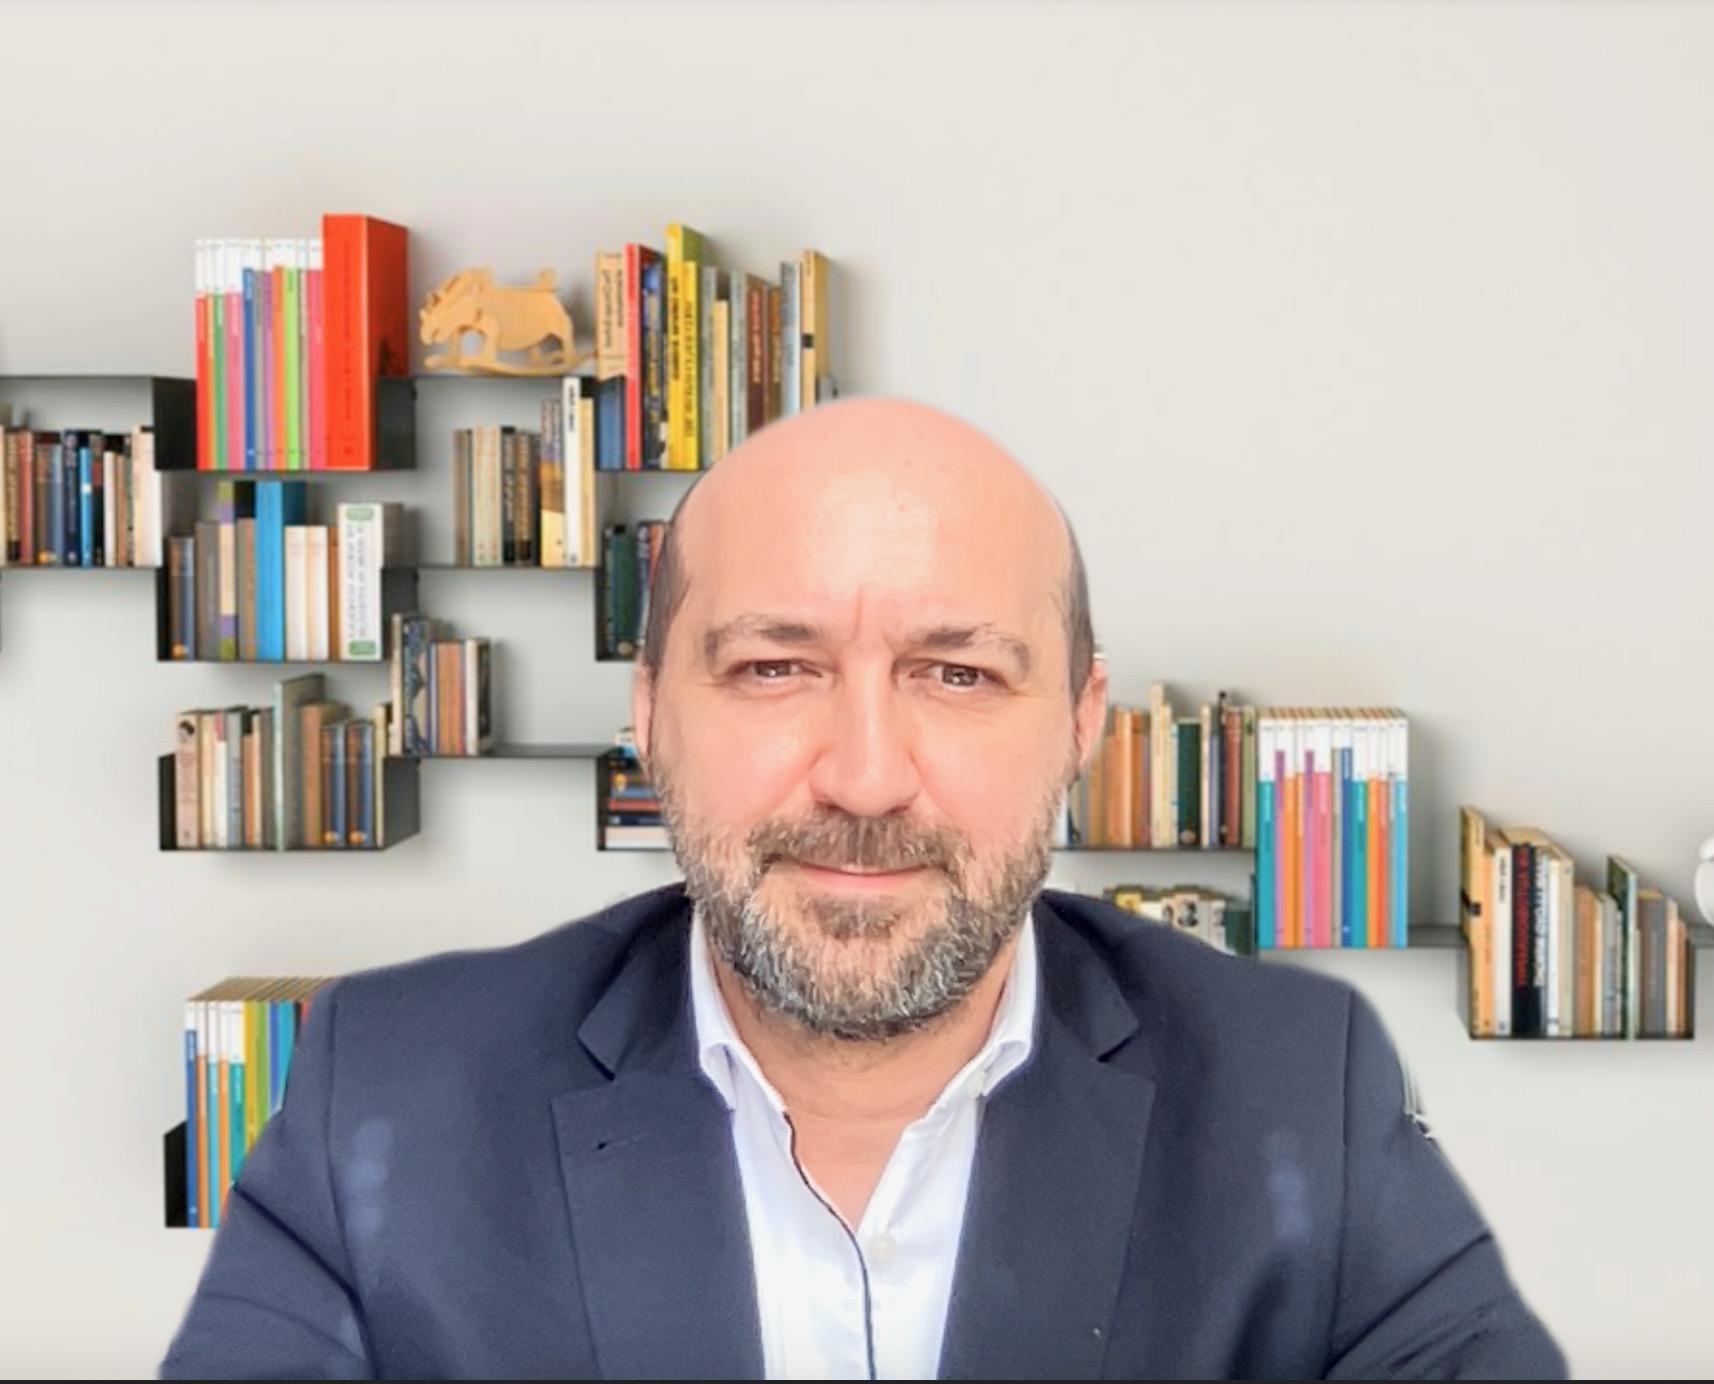 Luis de Miranda books